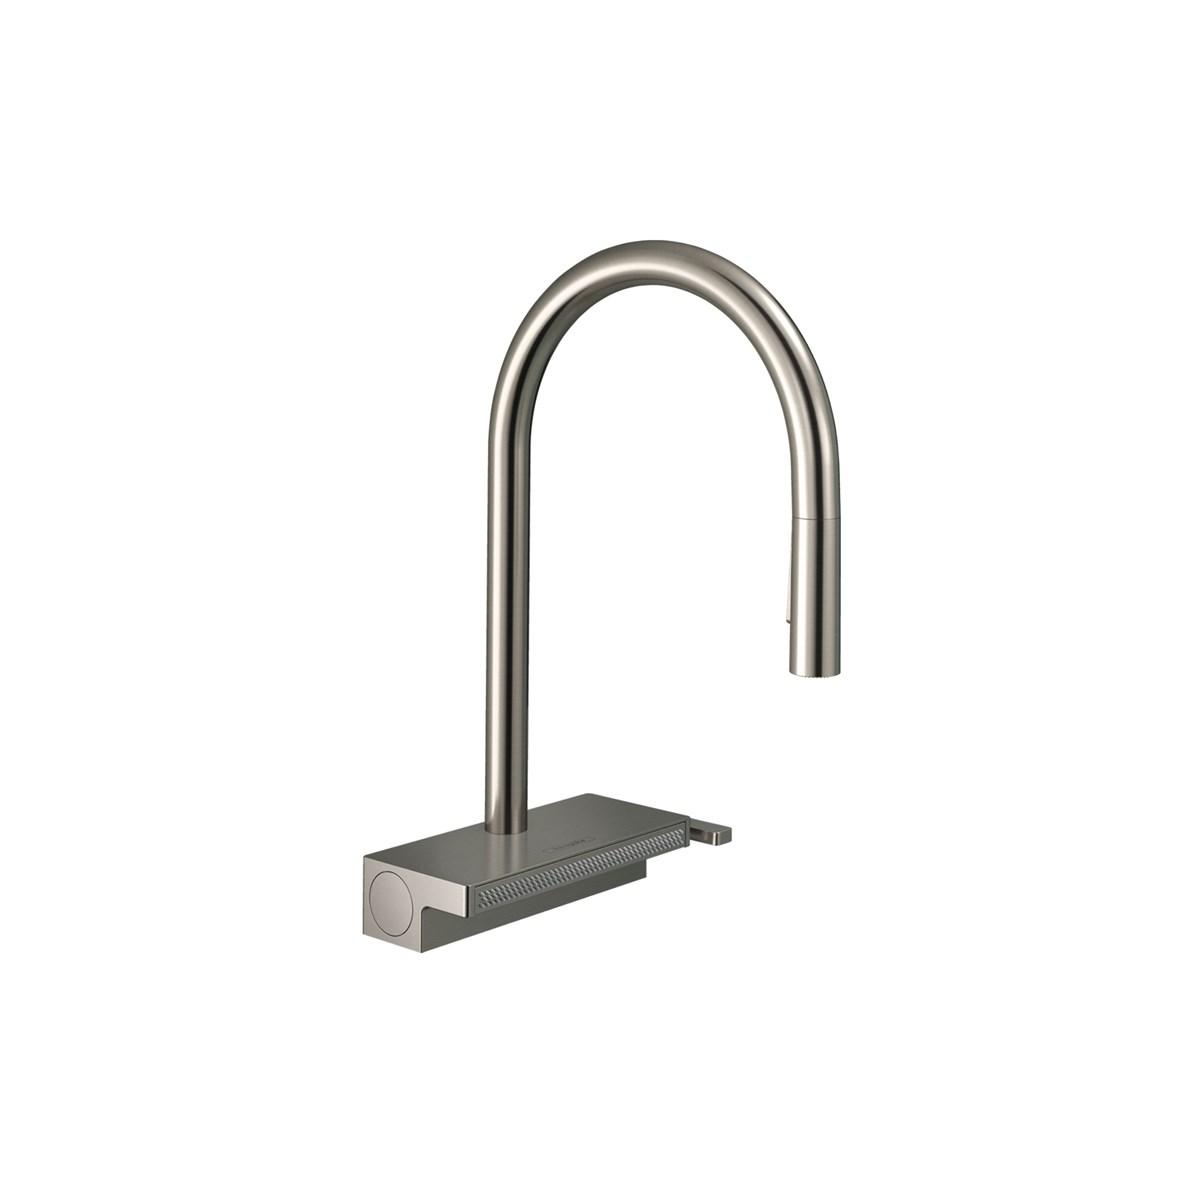 Hansgrohe-Aquno-Select-M81-Kitchen-Mixer-170-73837000-Matisse-1